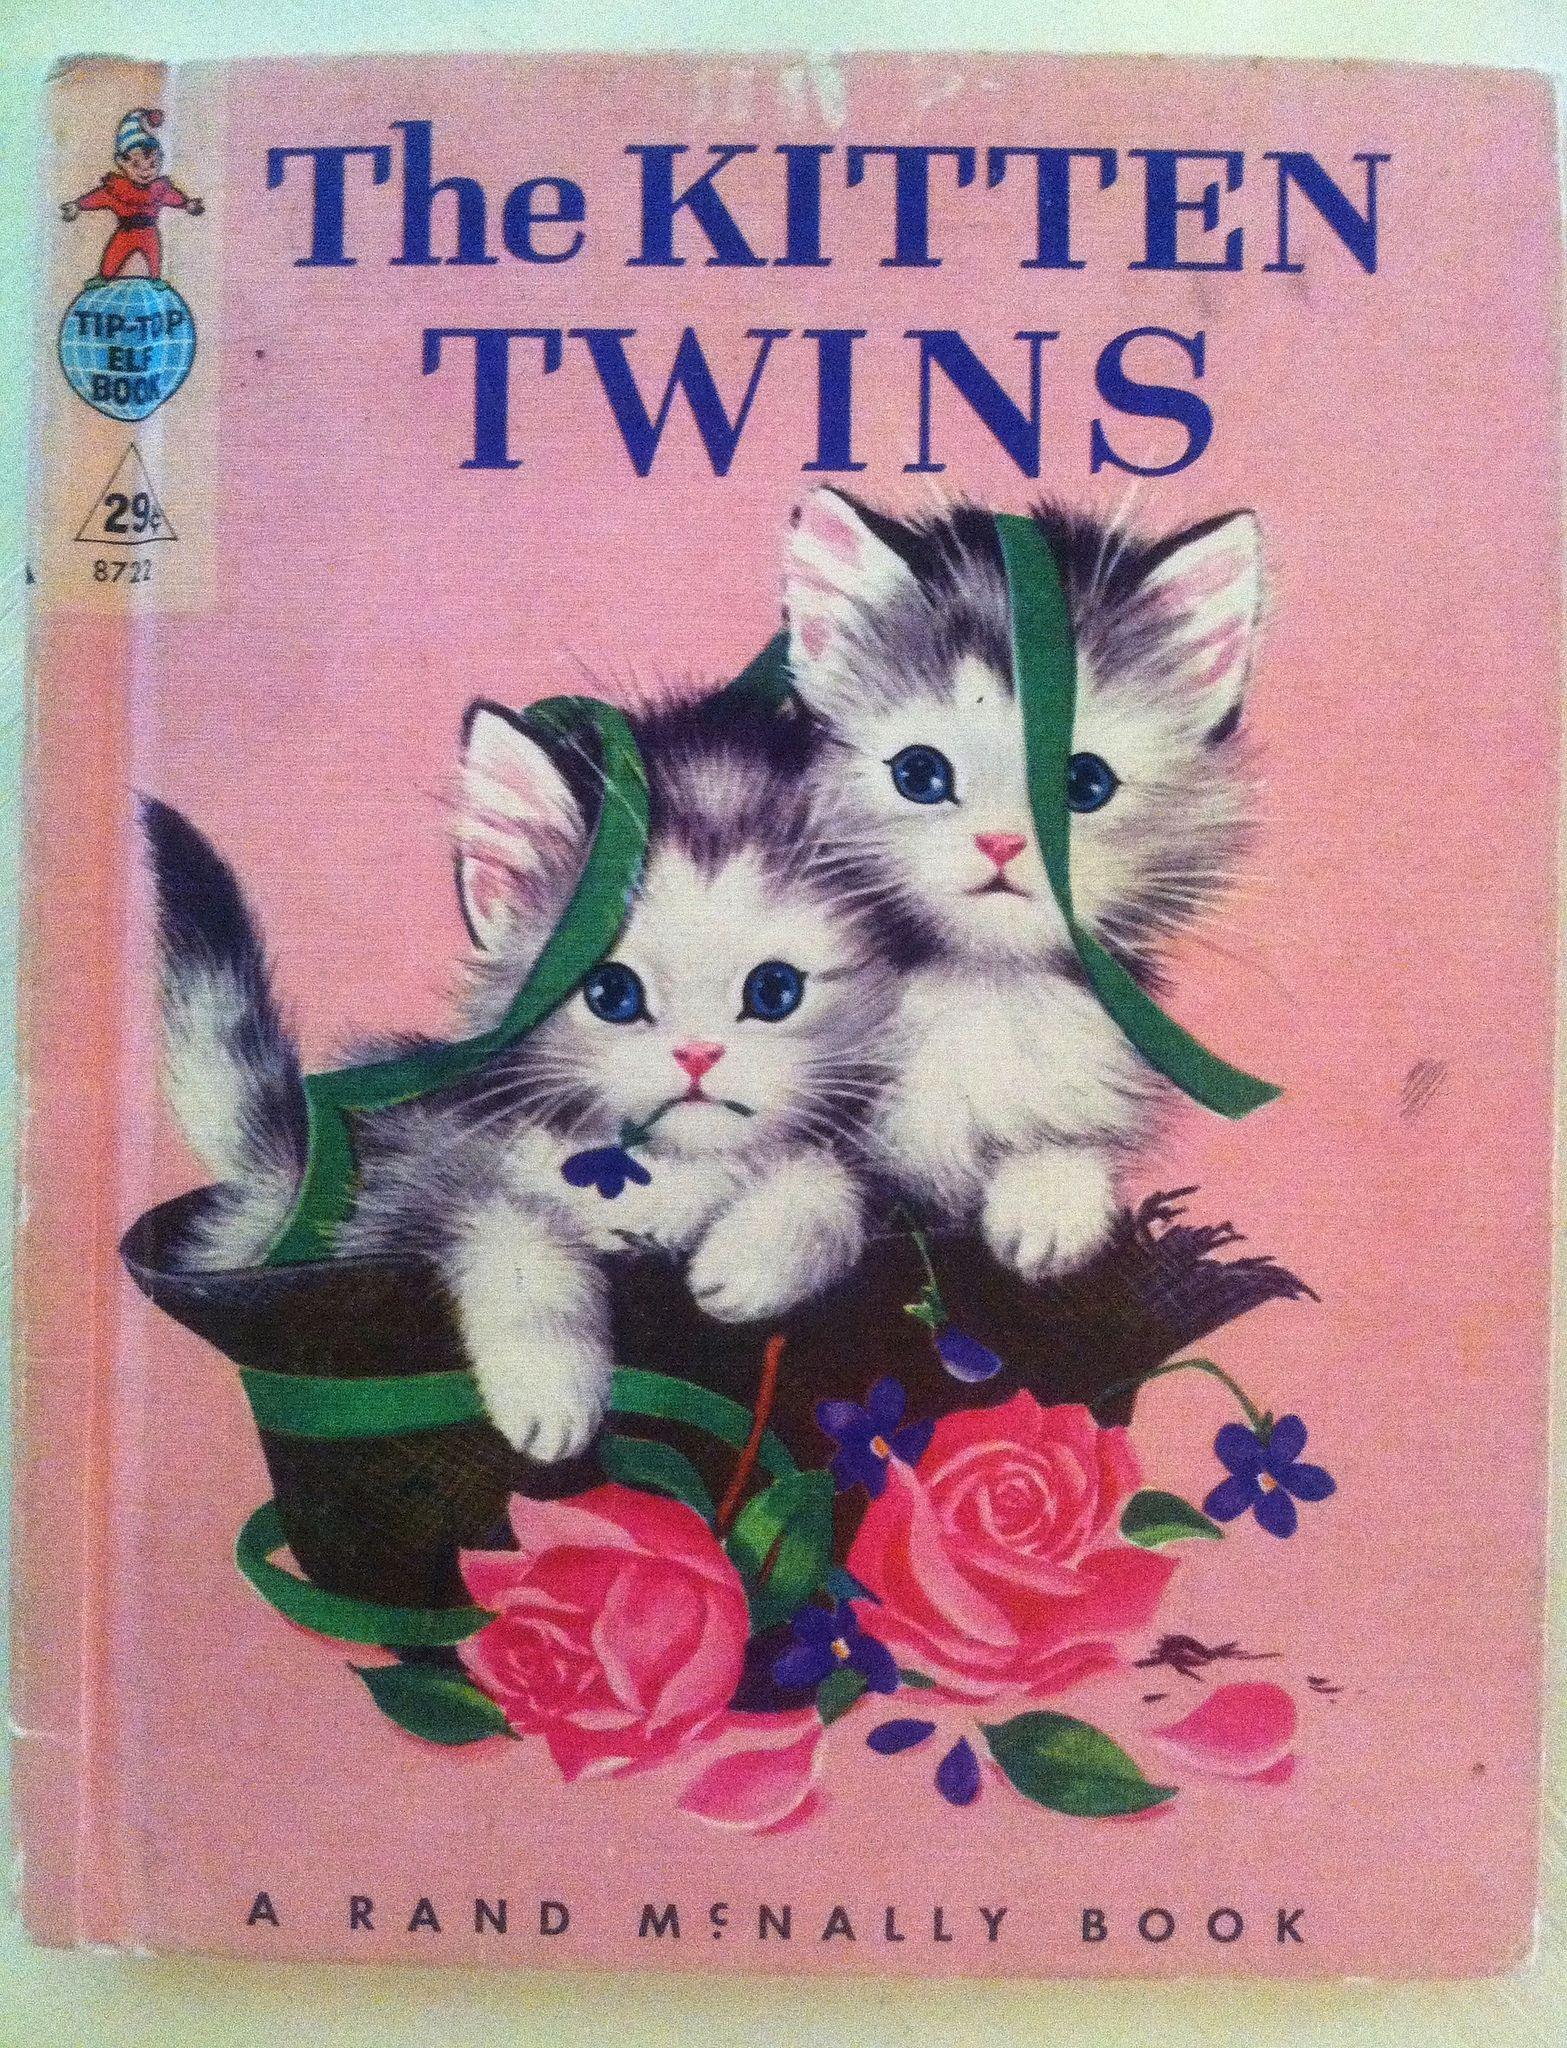 The Kitten Twins Vintage Children S Book Old Children S Books Cat Books Childrens Books Illustrations